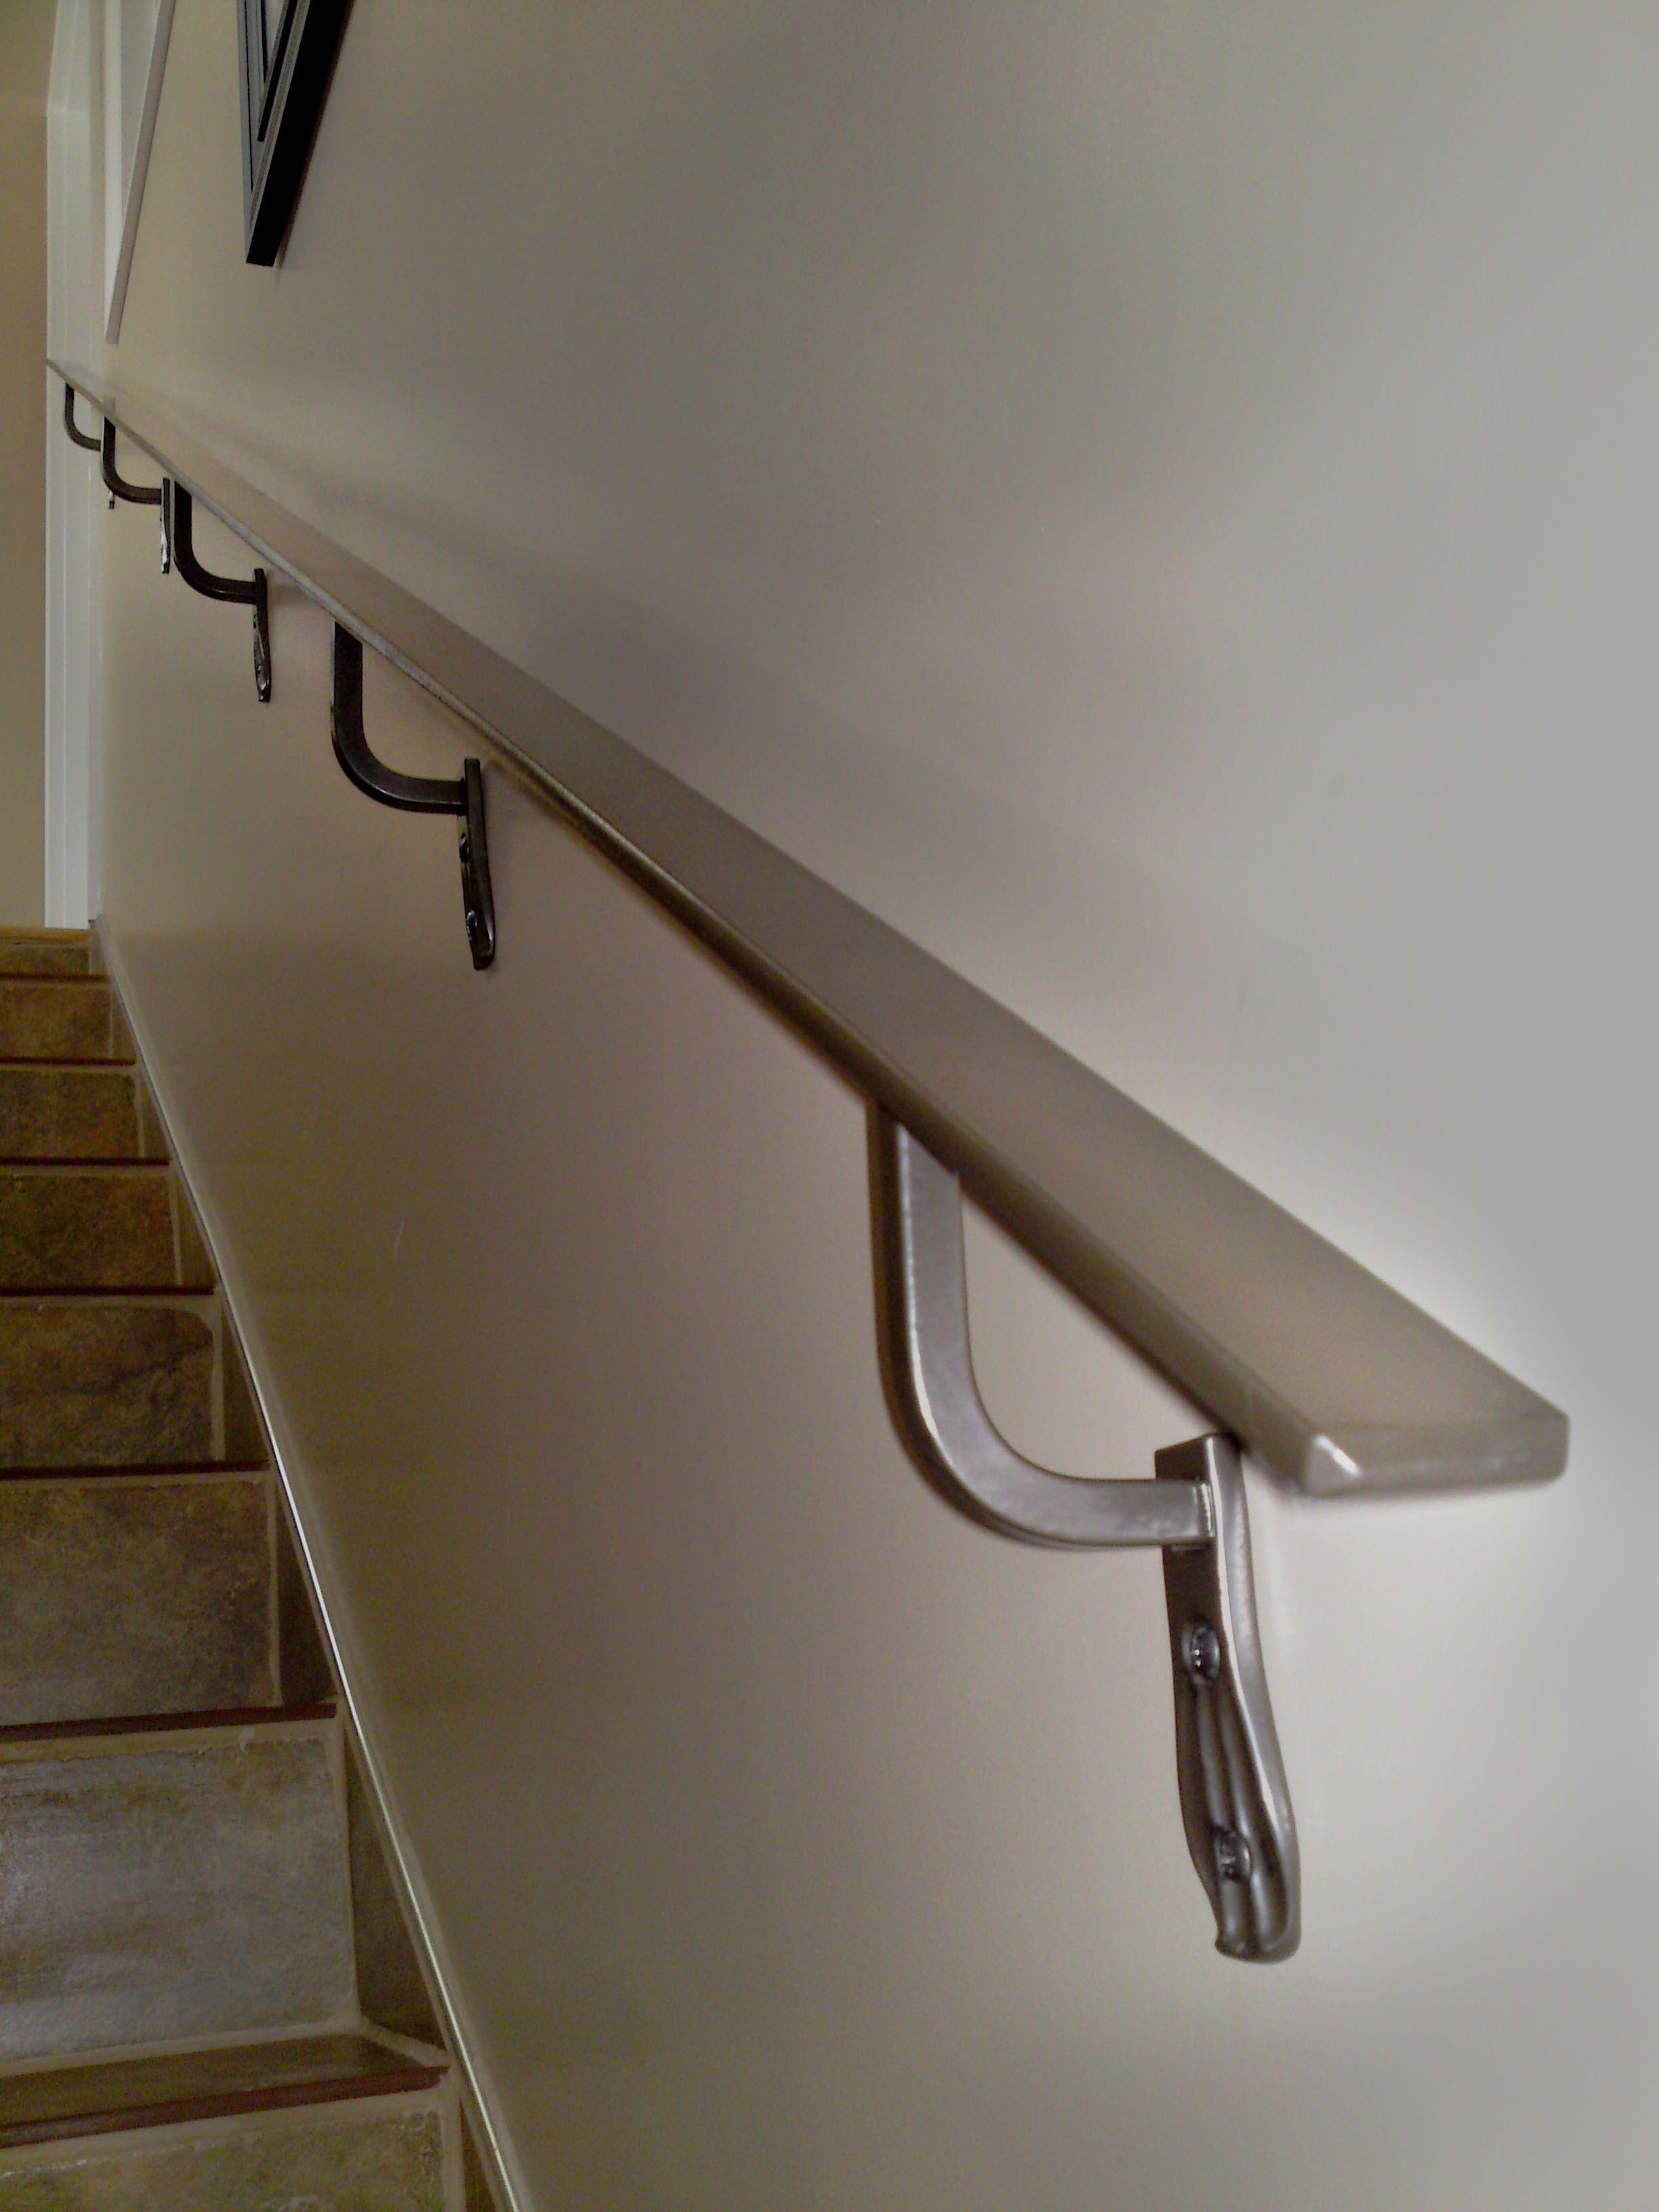 Shining Wall Mounted Handrails   MyHomeImprovement